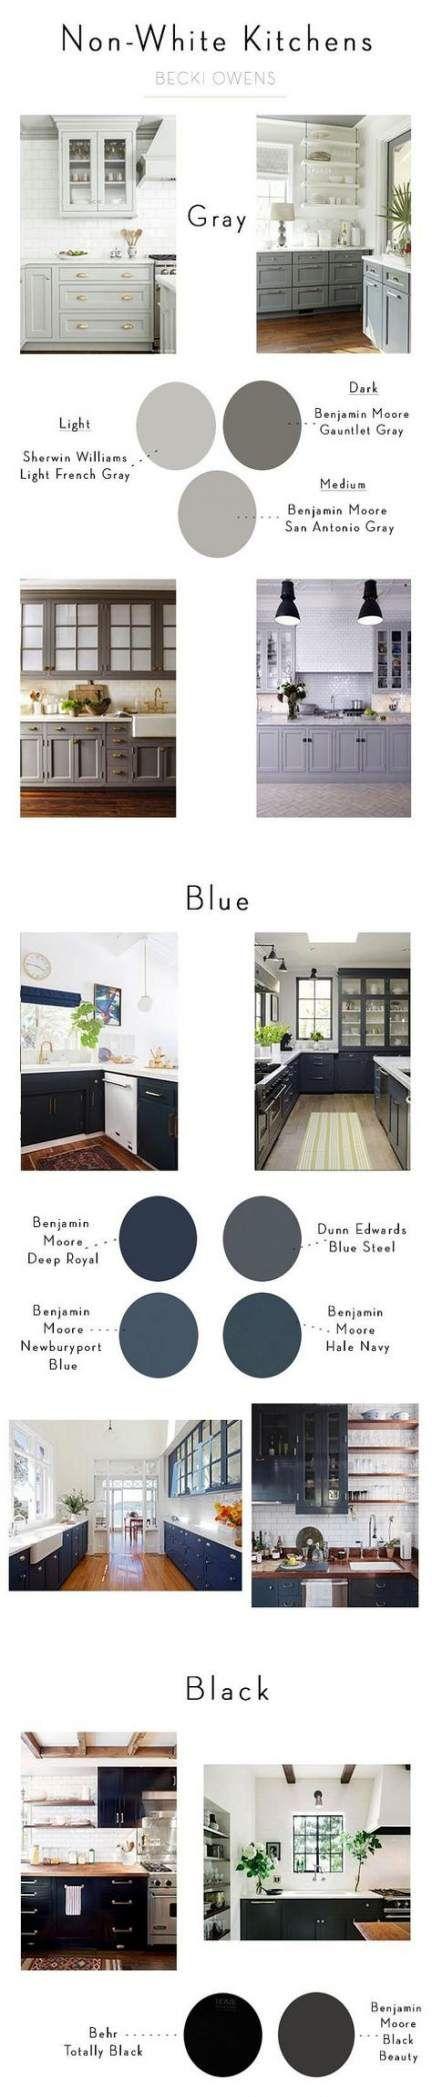 52 Trendy Kitchen Blue Walls Benjamin Moore Hale Navy #halenavybenjaminmoore